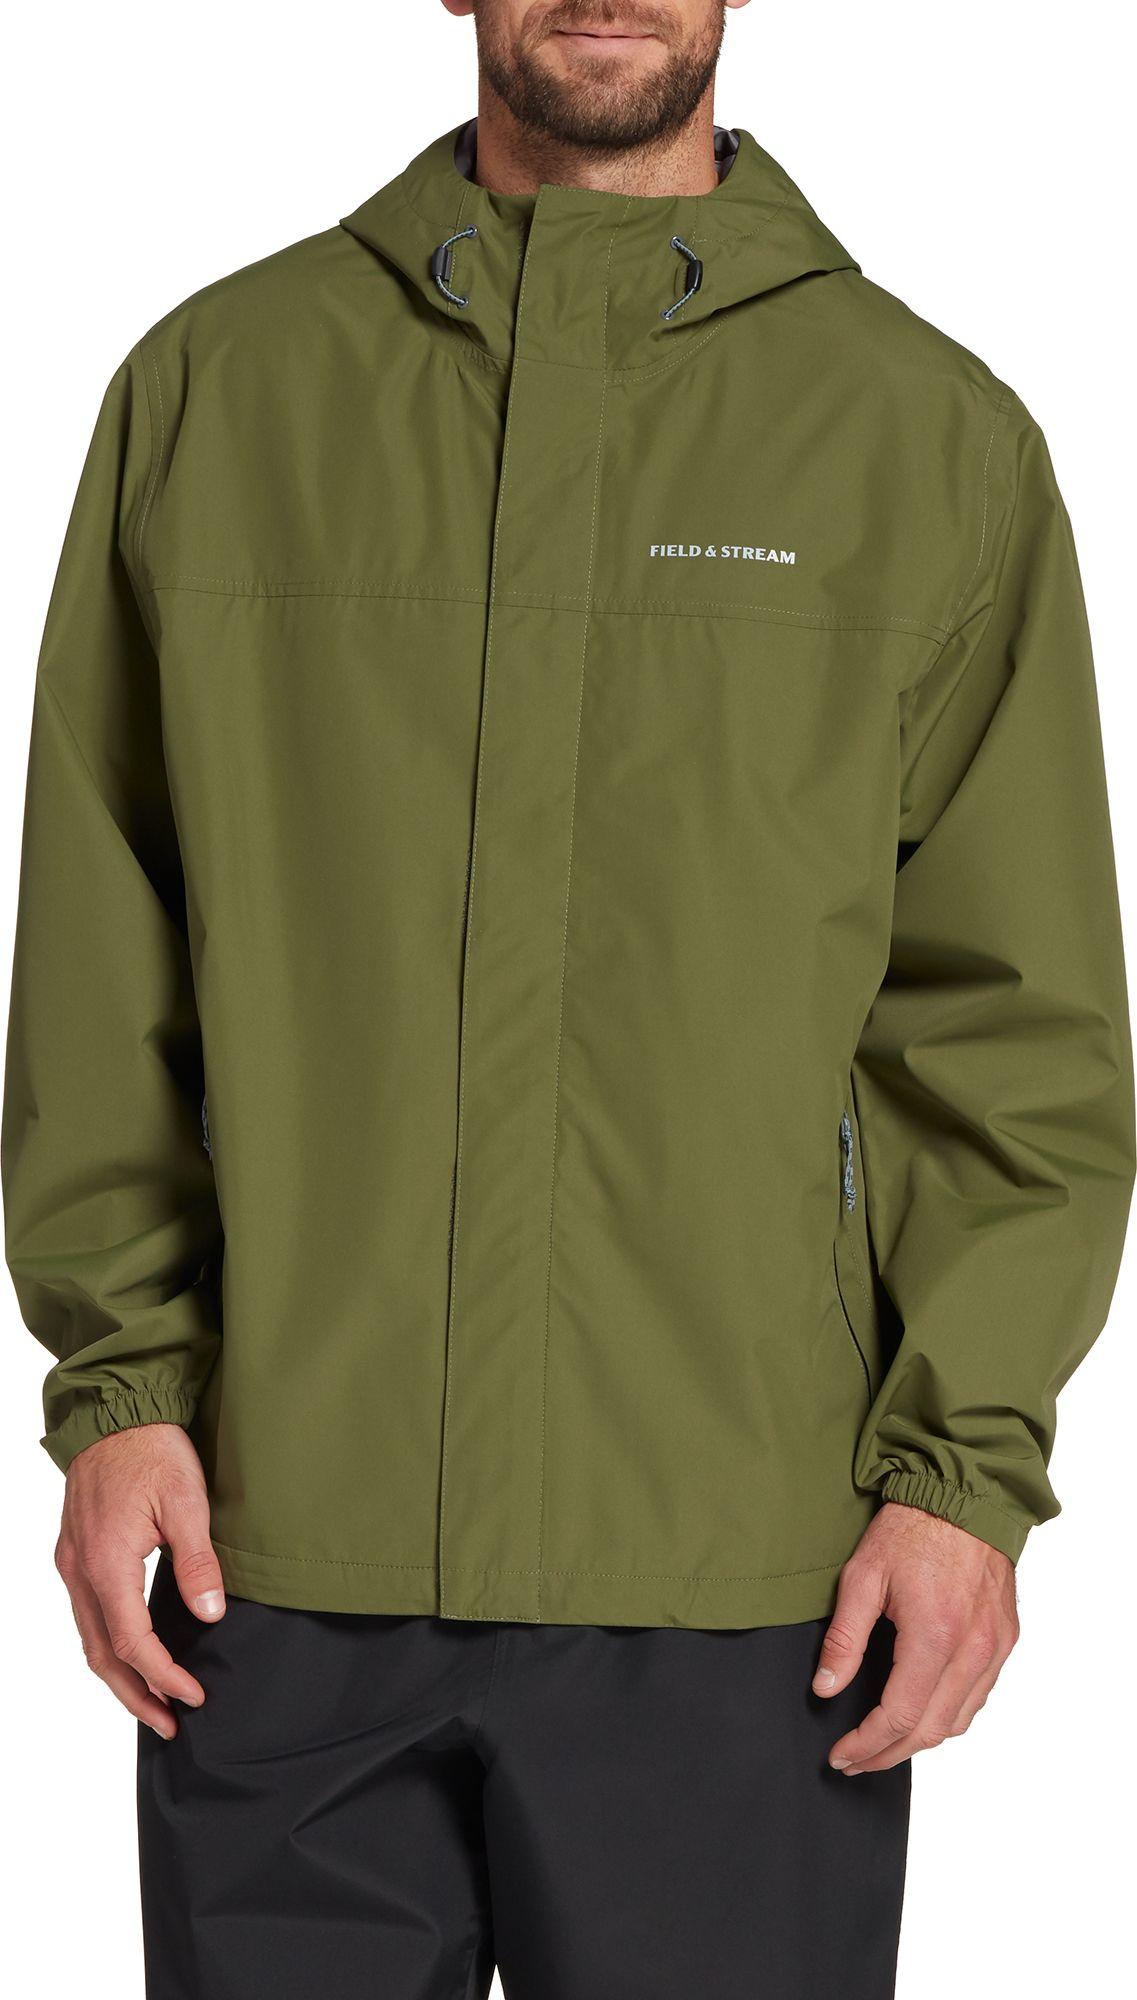 Field & Stream Men's Packable Rain Jacket, Small, Cypress Green